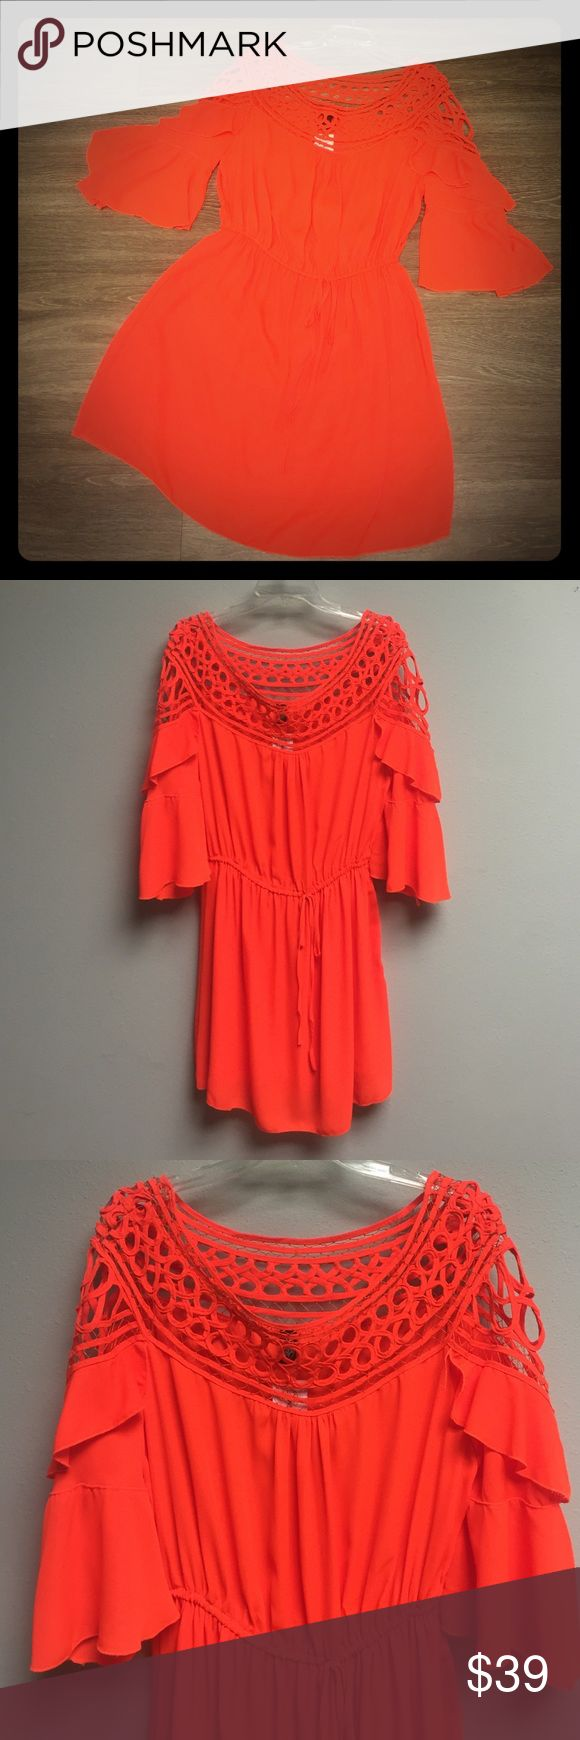 New PLUS SIZE orange dress! Bright orange plus size dress! Wide shoulder, flowy wide 3/4 sleeves! Drawstring around waist! Available in XL, 2XL, 3XL! Dresses Midi